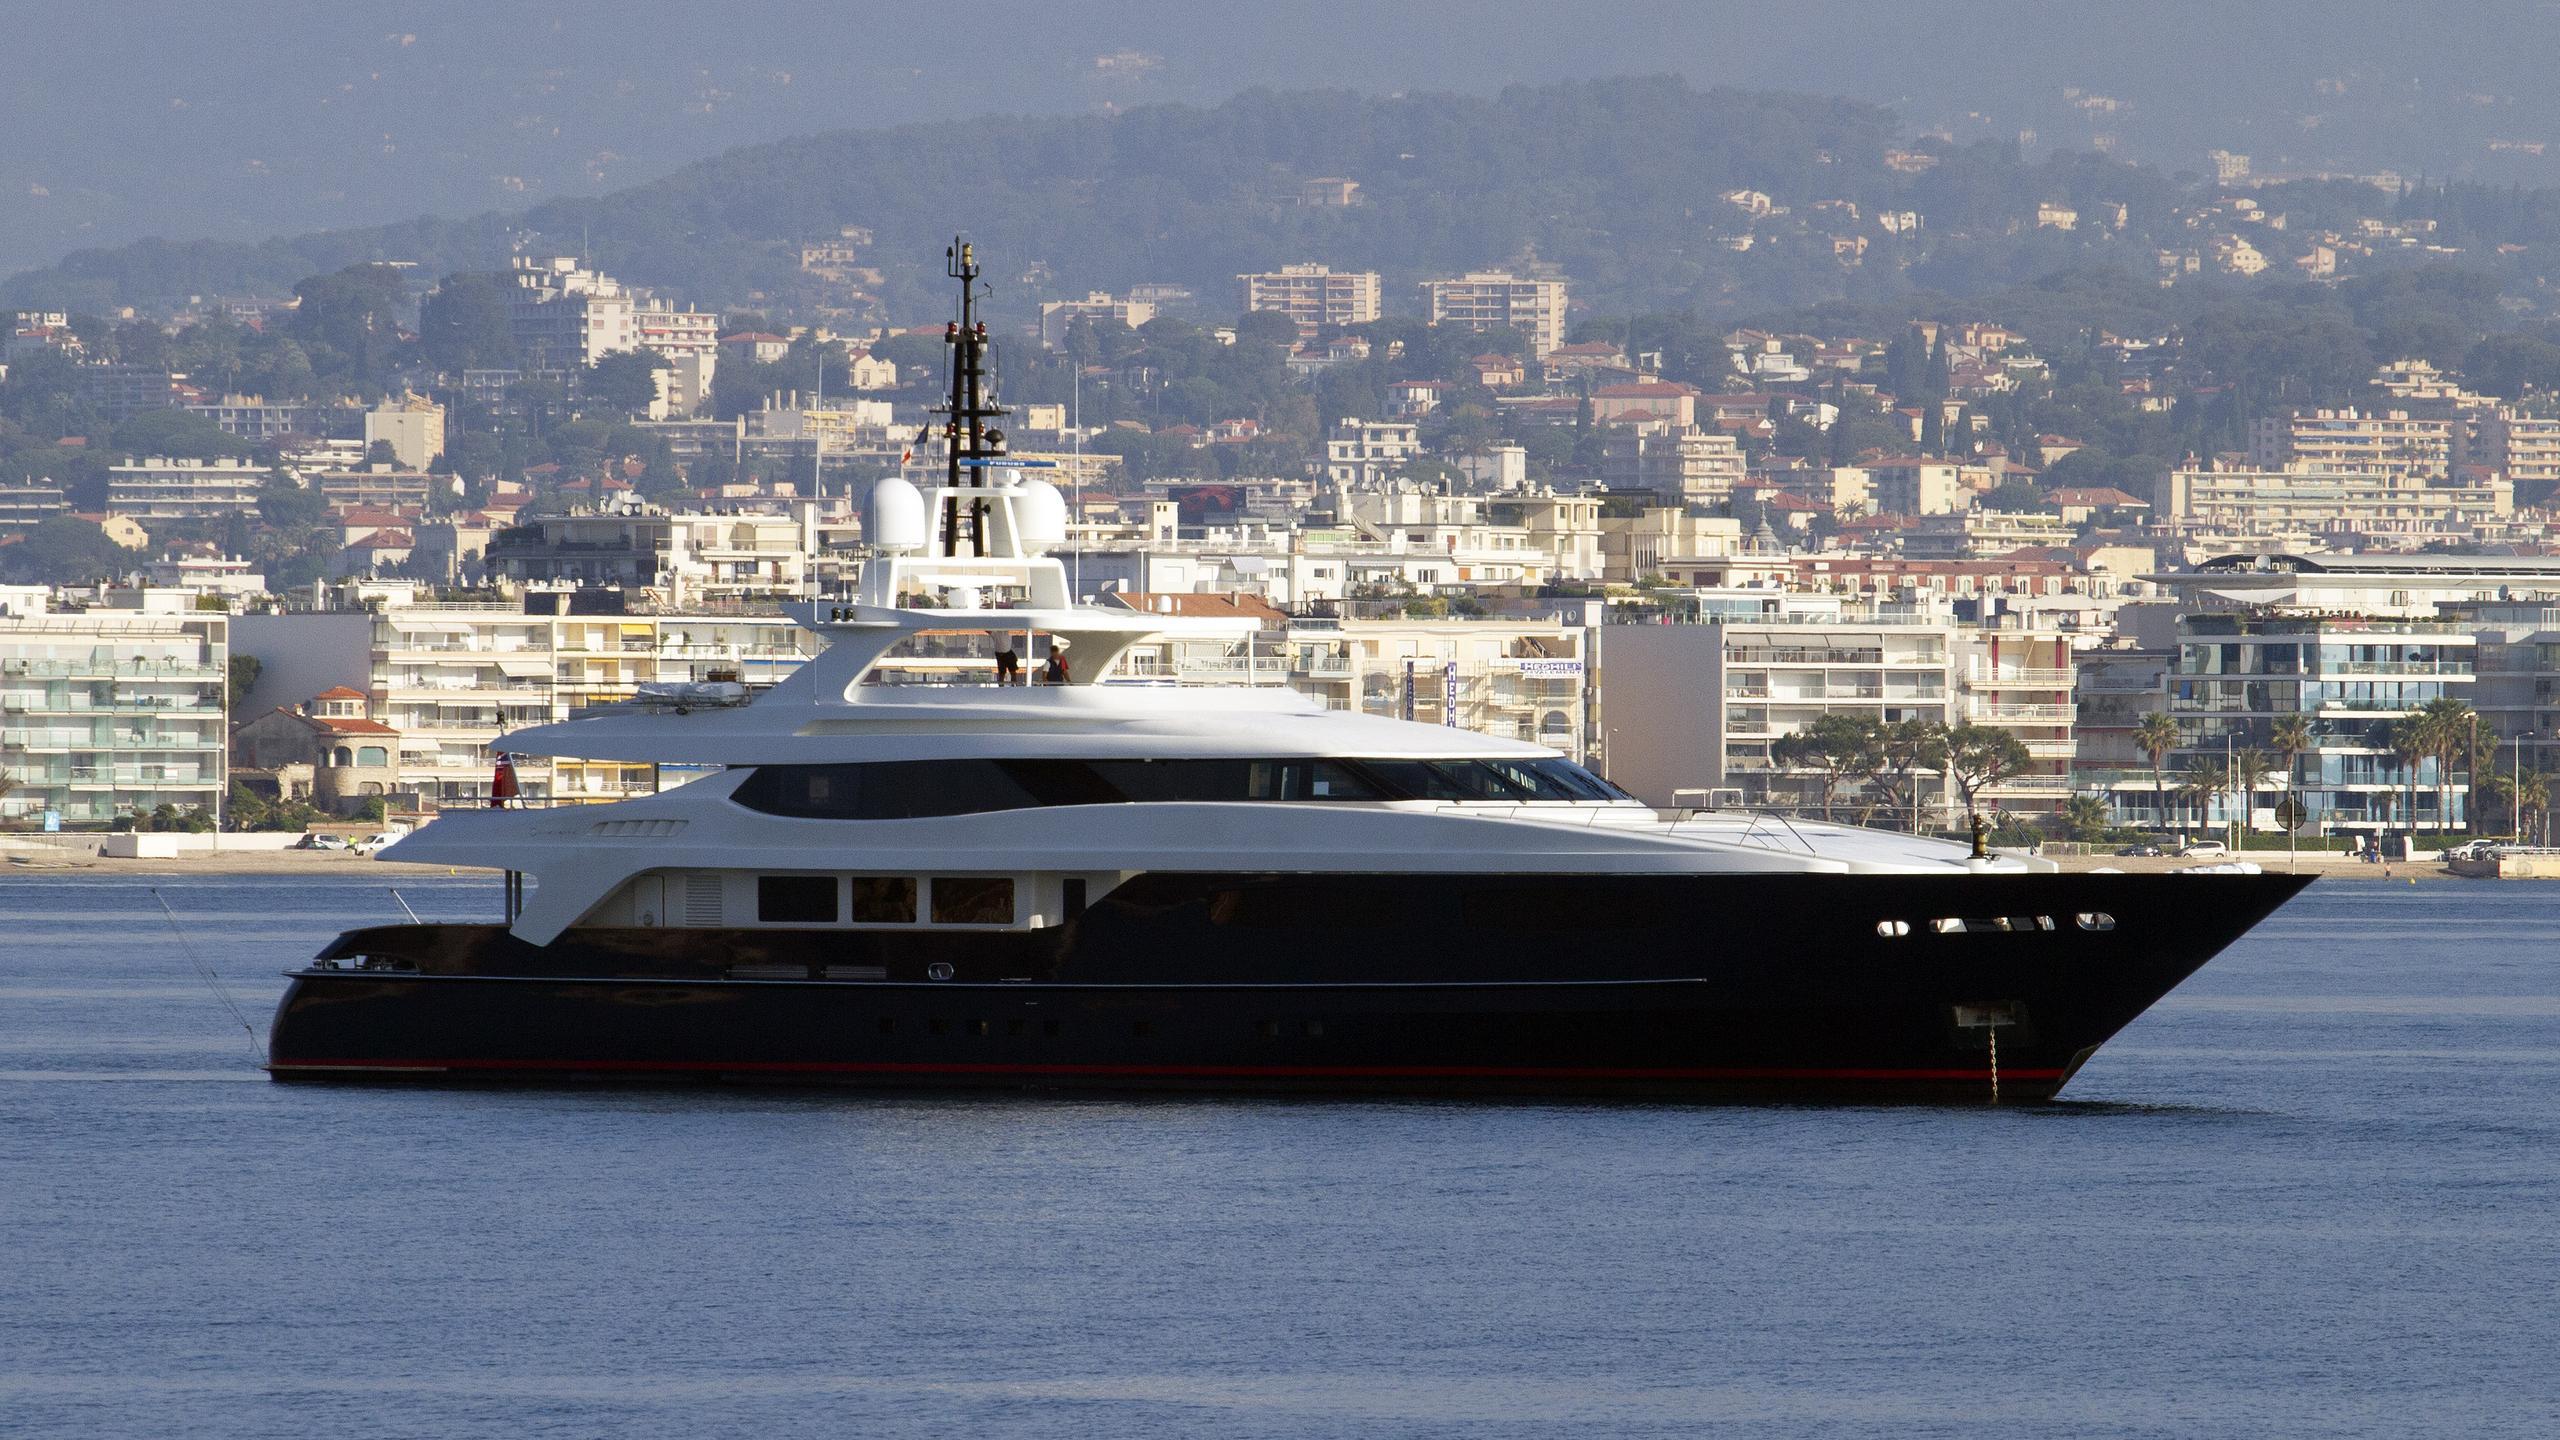 mischief-motor-yacht-baglietto-53m-2006-half-profile